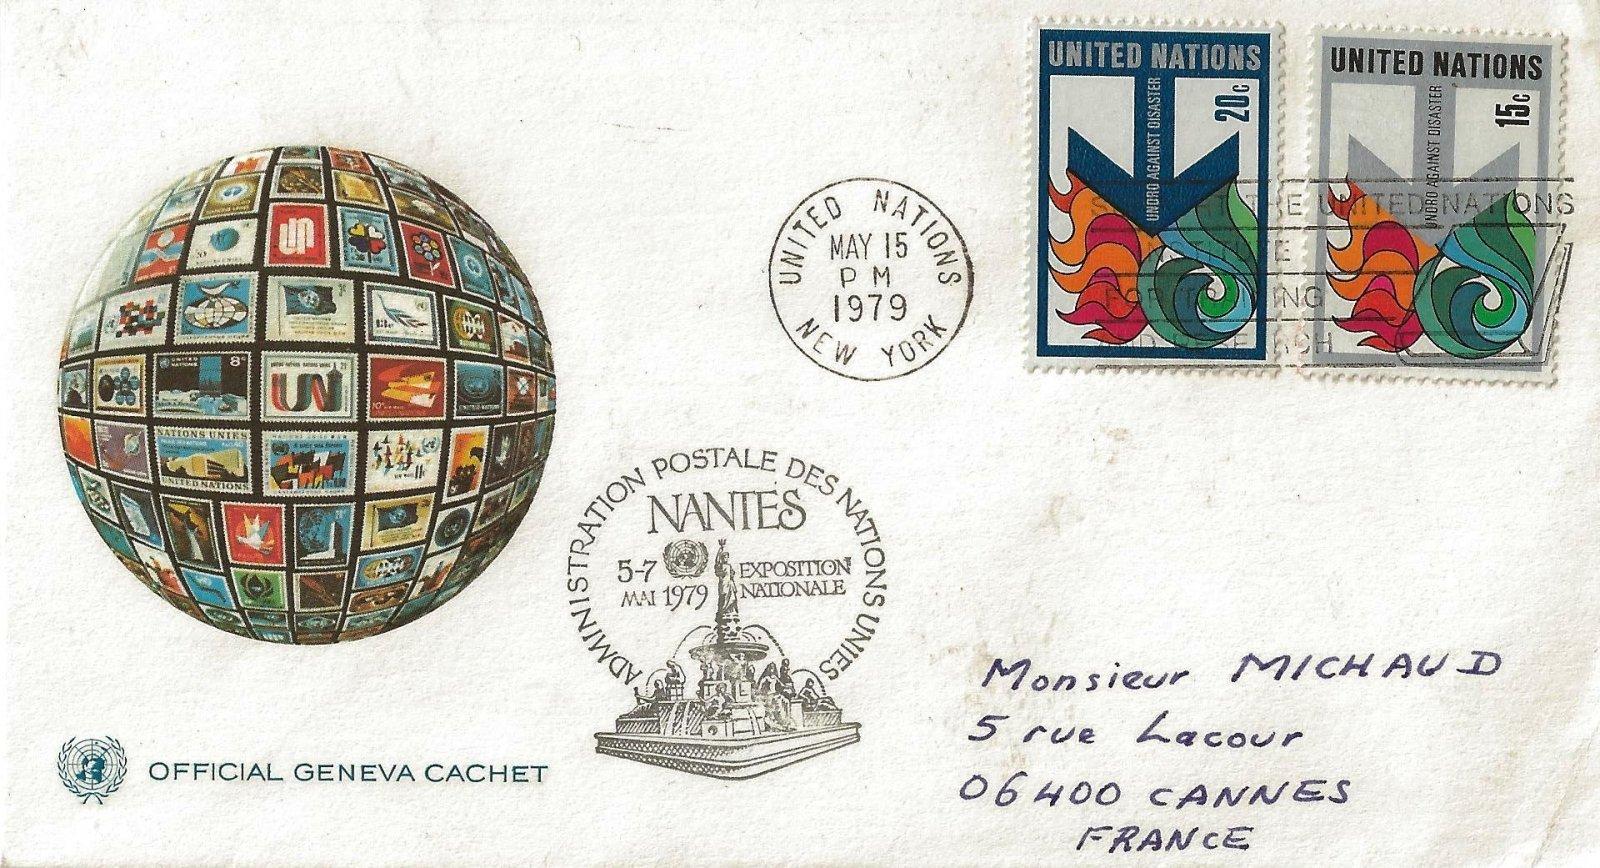 1979 ADM POSTALE NATIONS UNIES